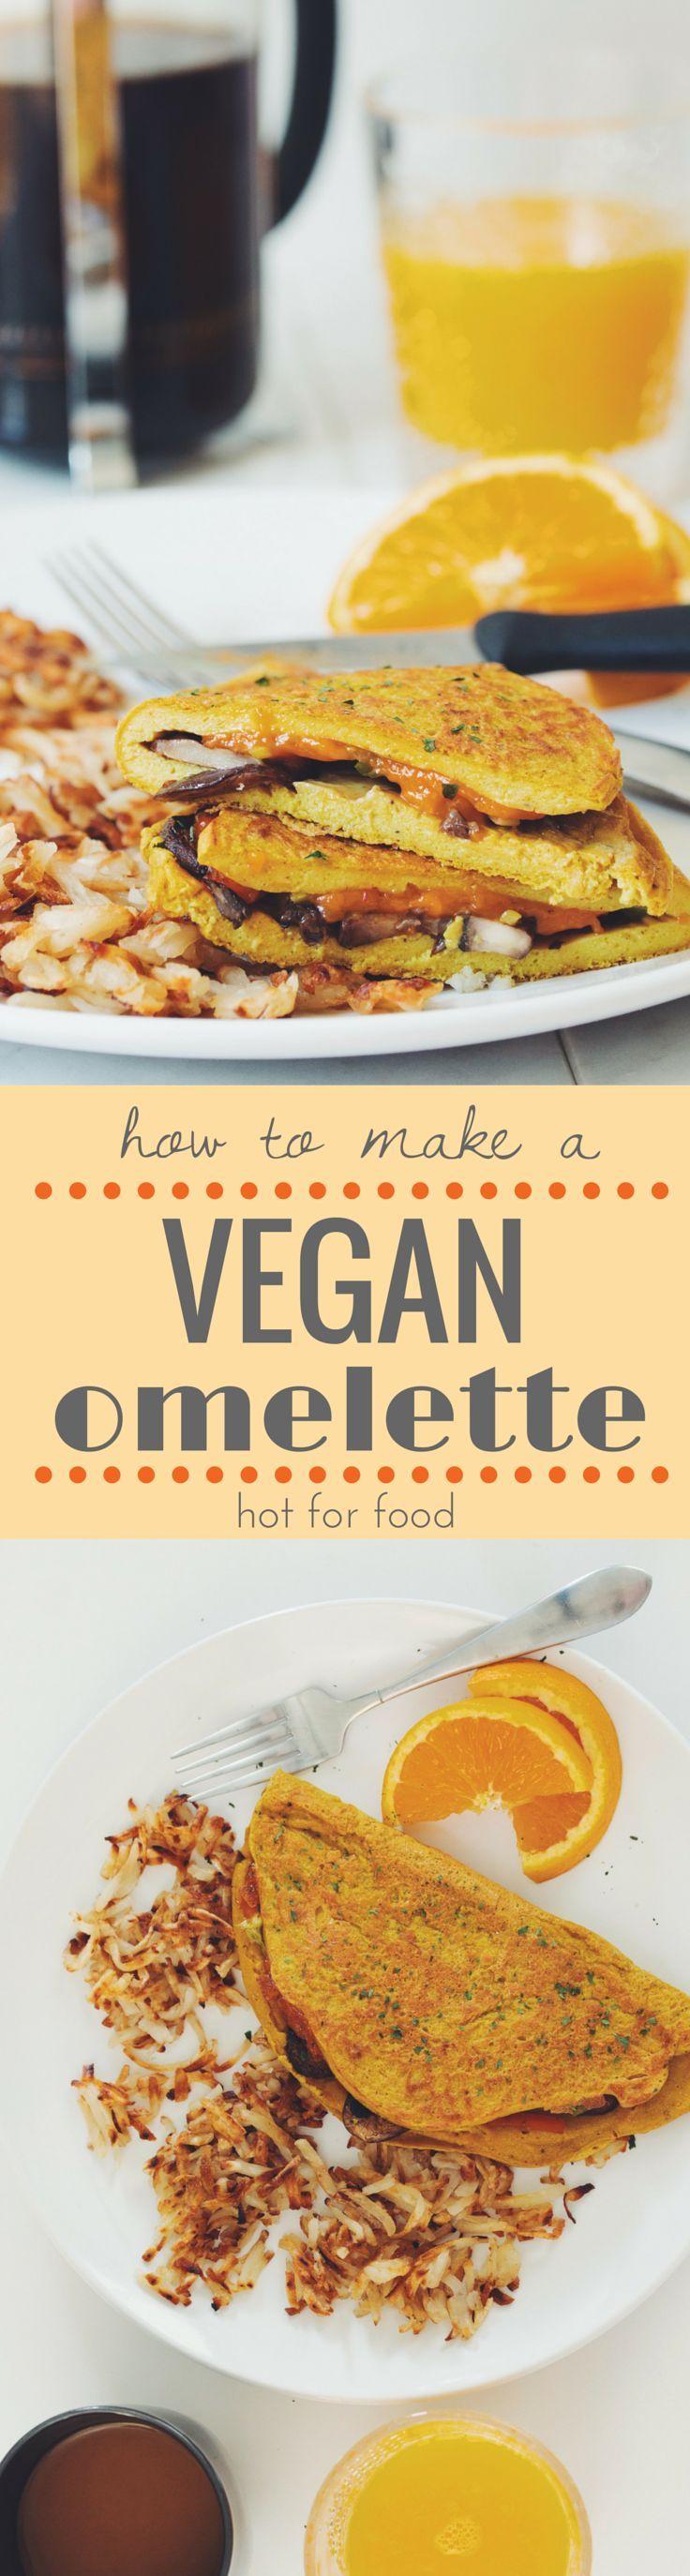 how to make a vegan omelette | RECIPE on http://hotforfoodblog.com